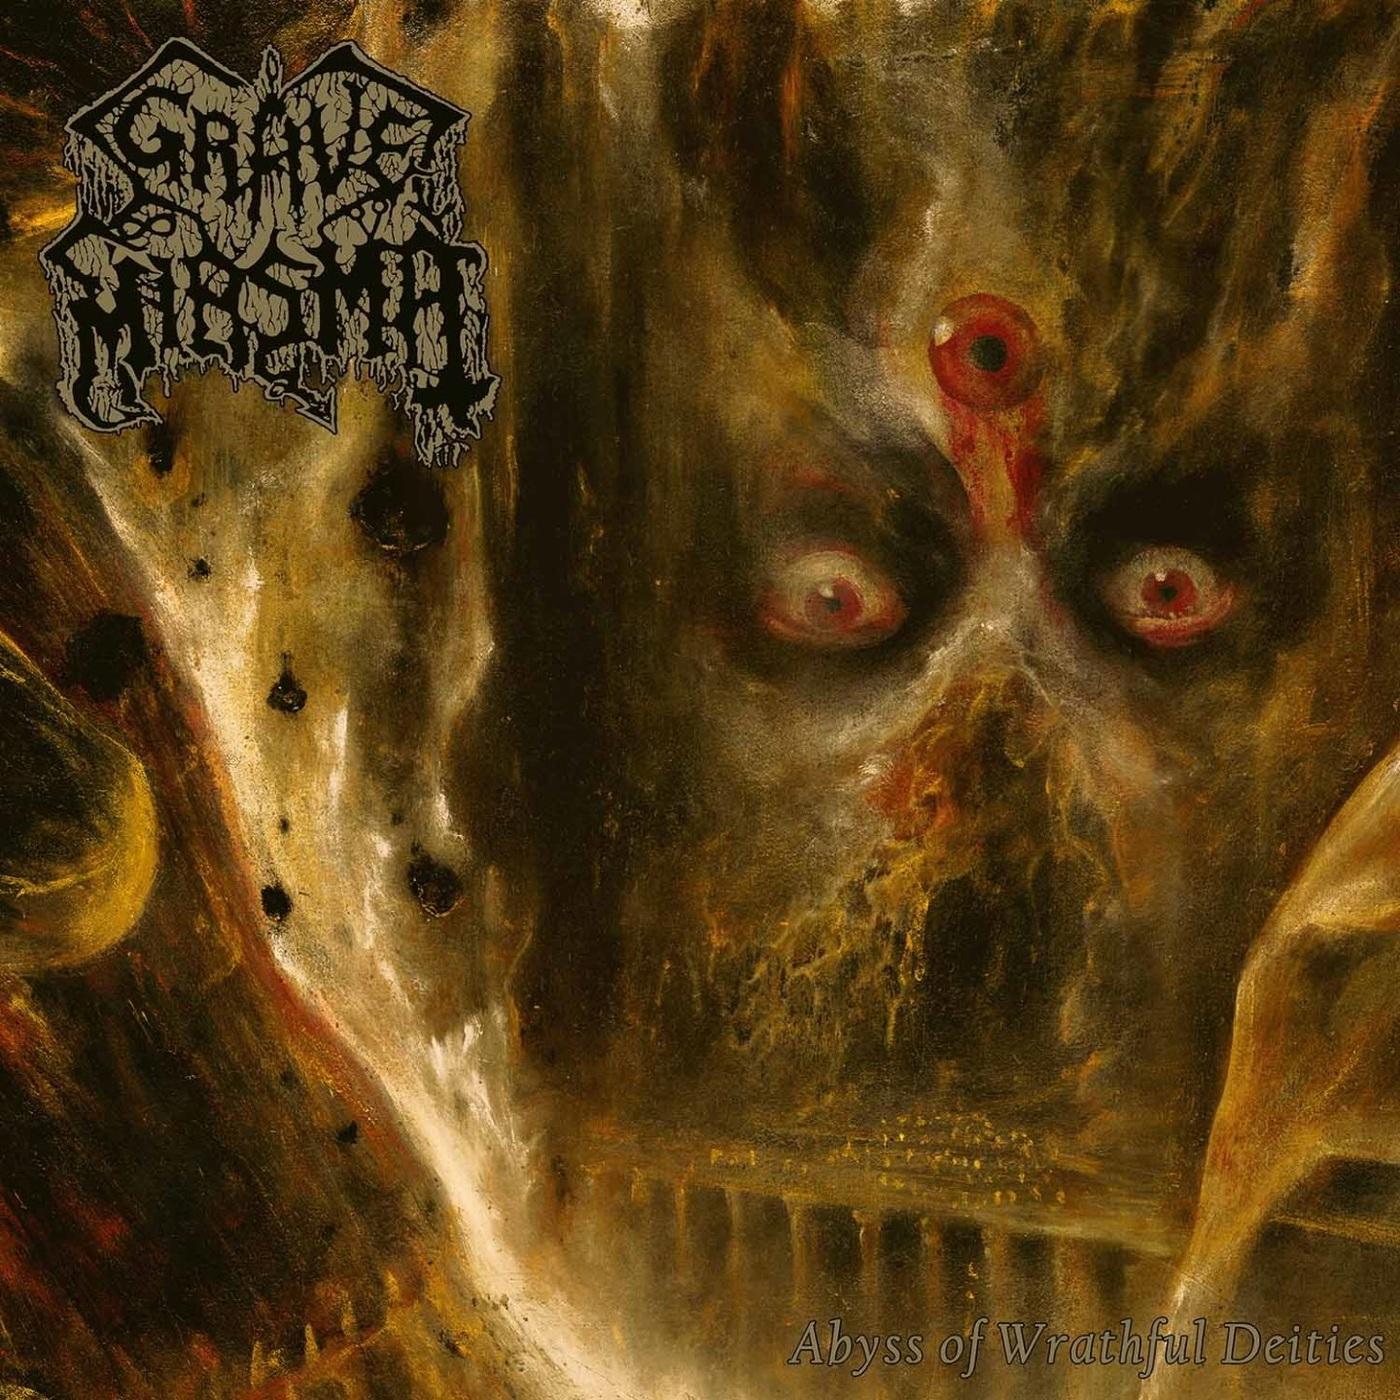 Grave Miasma - Abyss Of Wrathful Deities - 2021